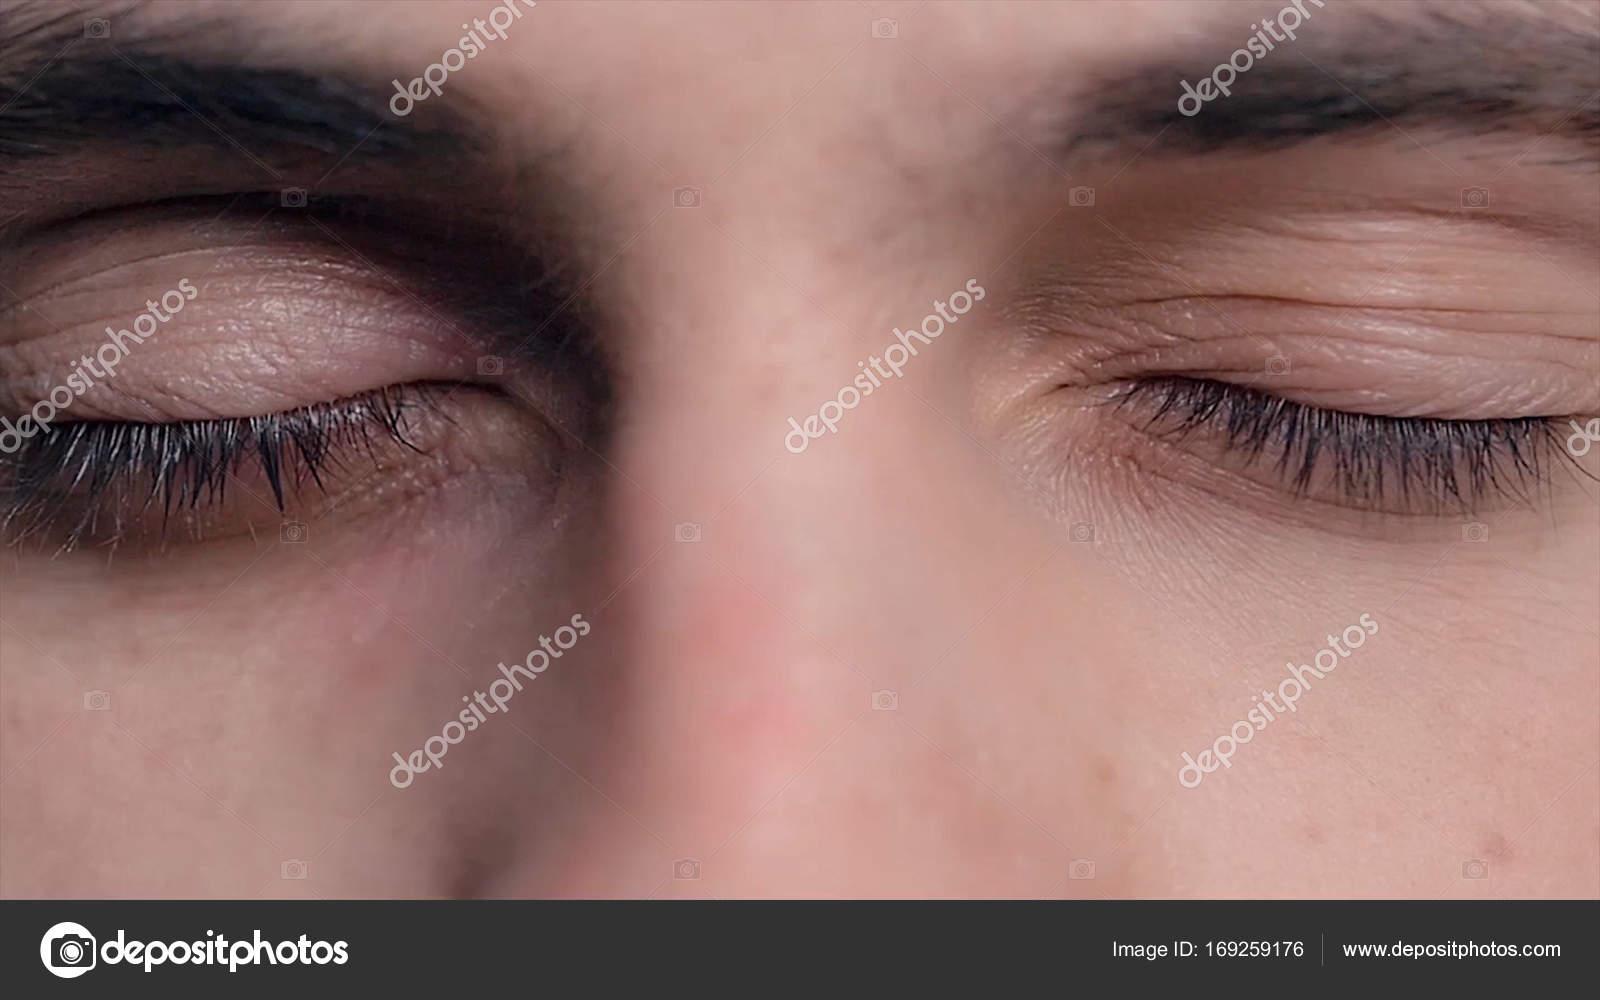 138f60f995 Closeup των νέων επανδρώνει μπλε μάτια με προβληματικές επιδερμίδες με τάση  ακμής και επιλεκτική εστίαση. Close-up πορτρέτο ενός νεαρού άνδρα με μπλε  μάτια ...